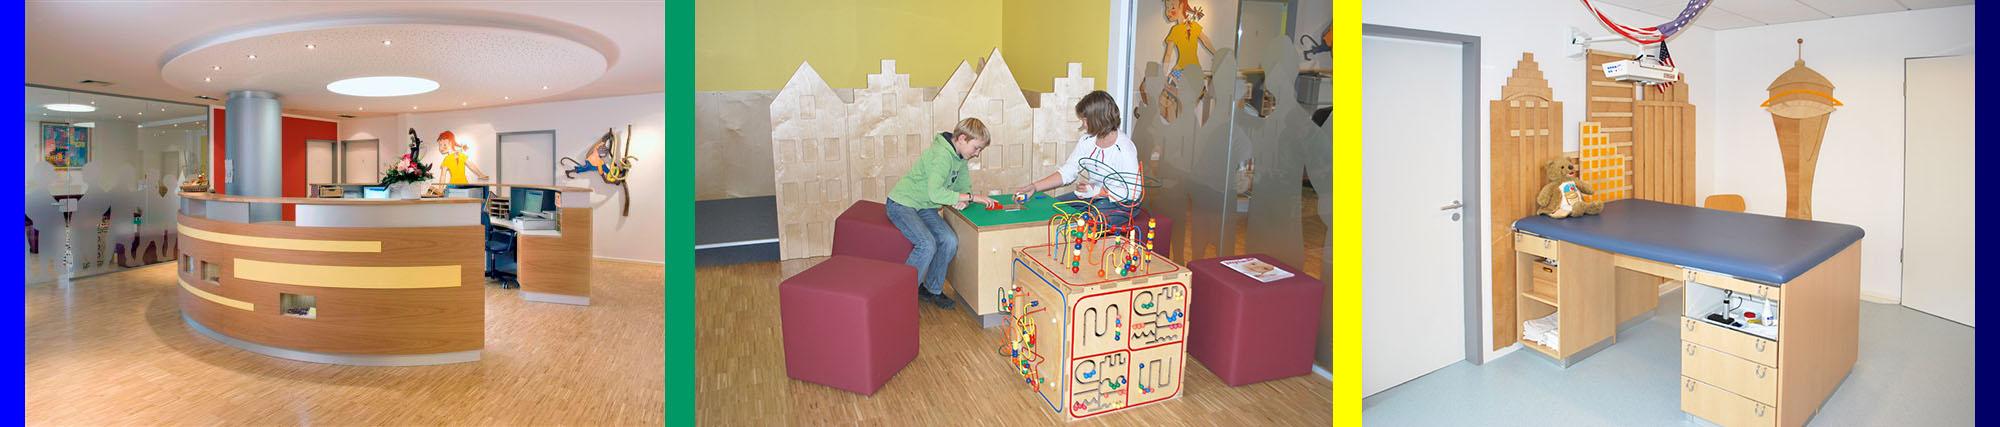 Kinderarzt Münster